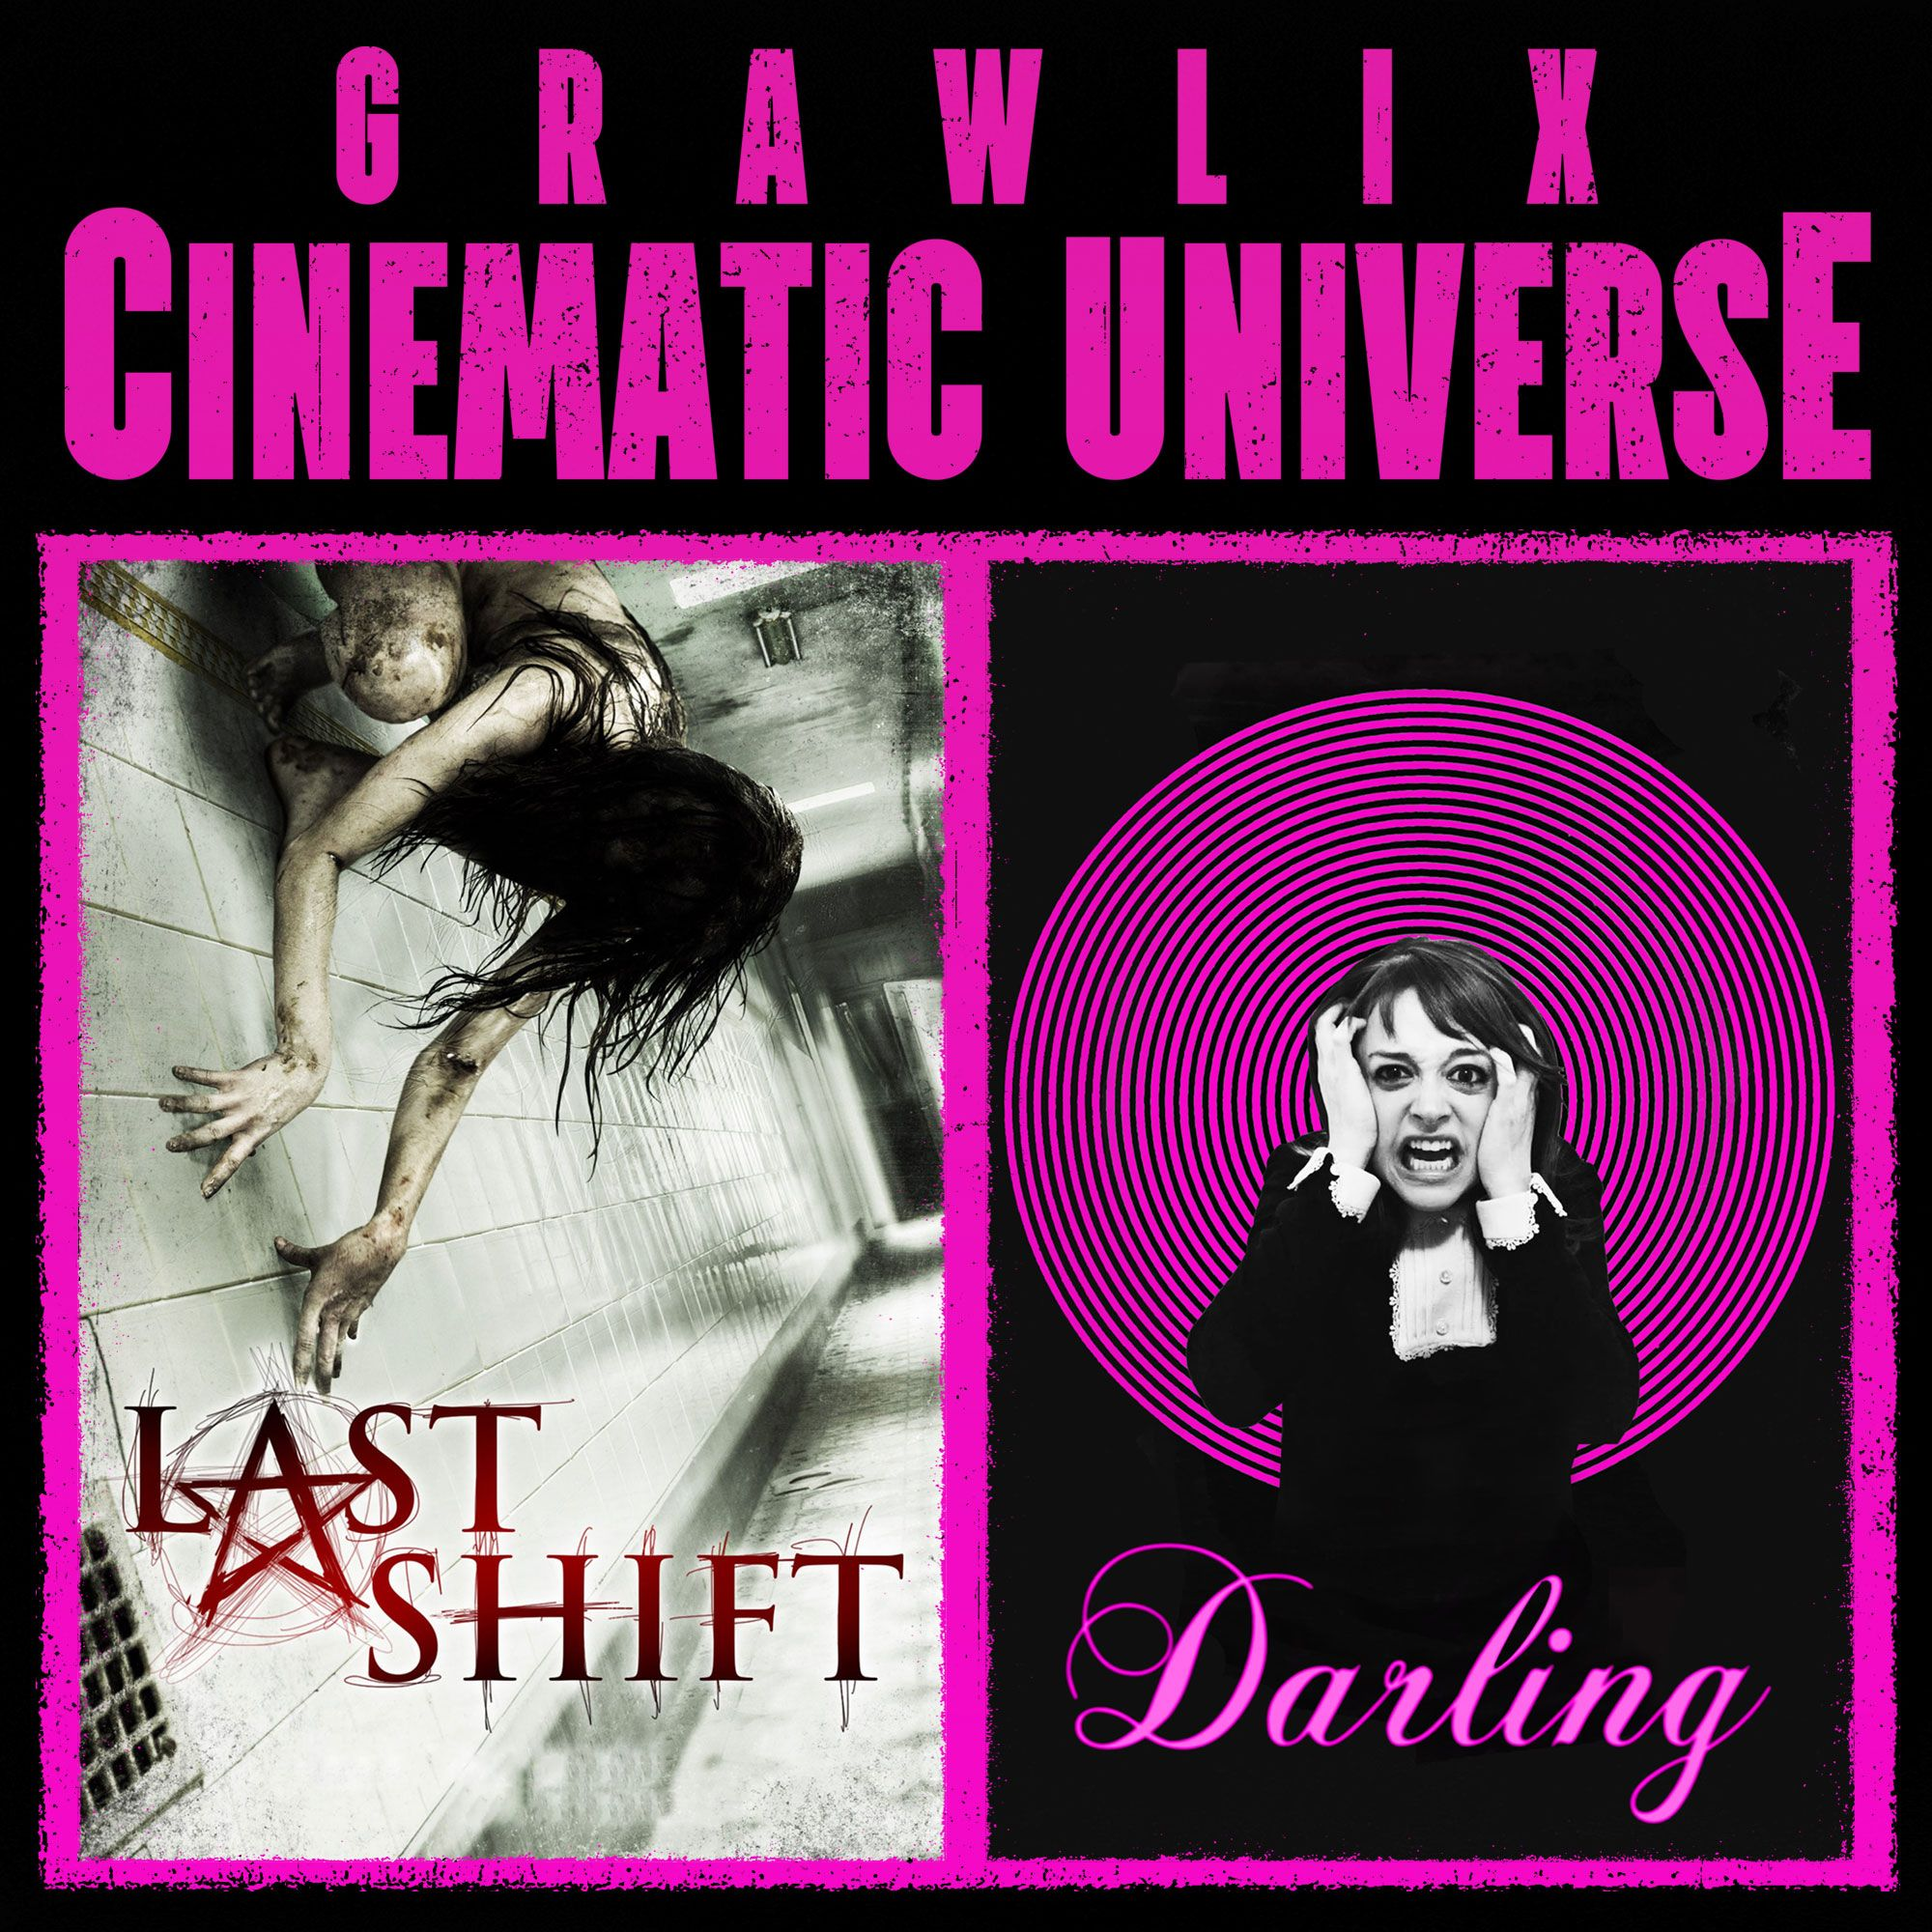 GCU 35 Last Shift & Darling Darling 2015, Two movies